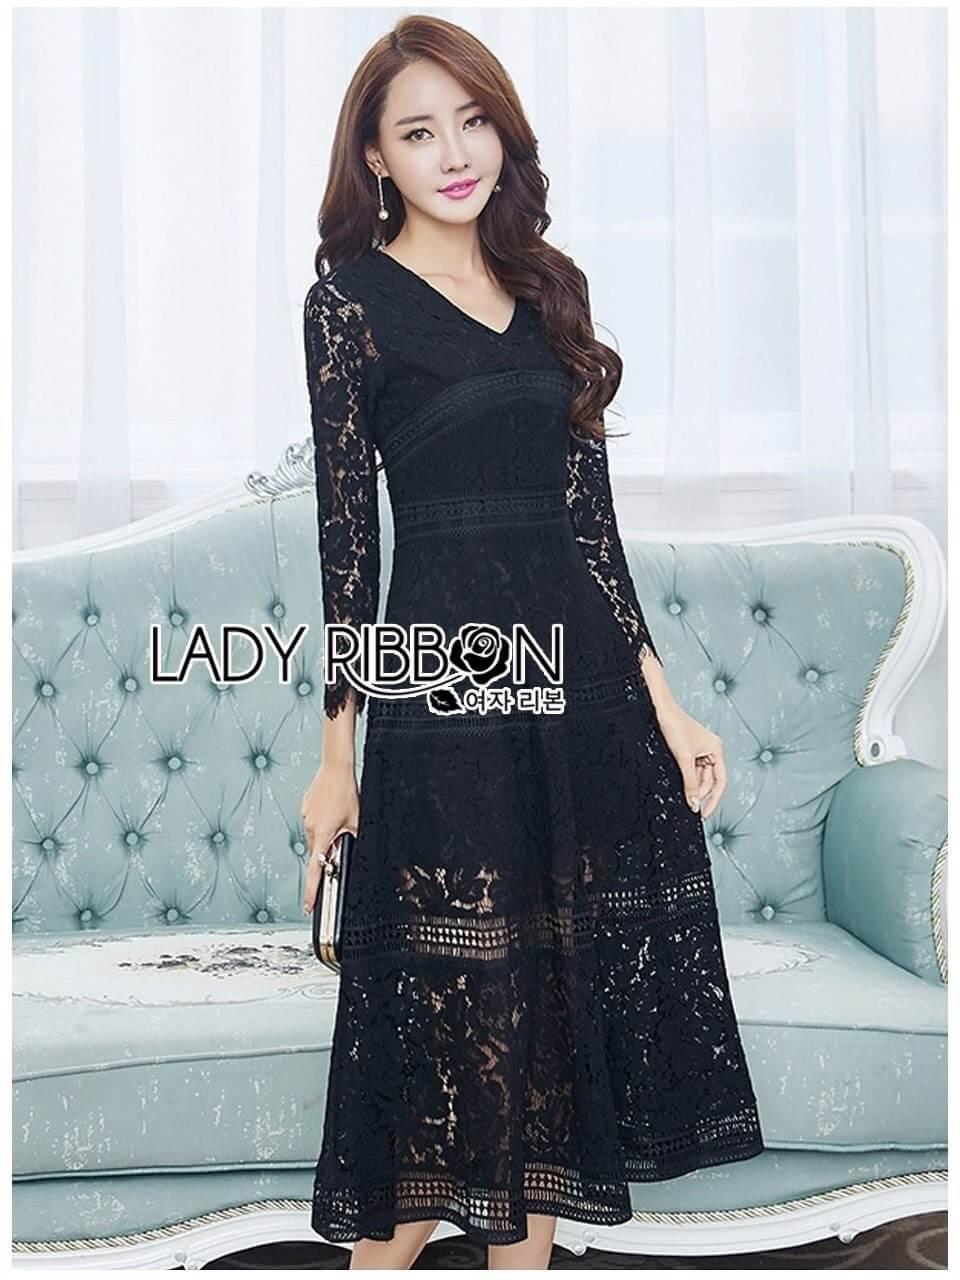 &#x1F380 Lady Ribbon's Made &#x1F380 Lady Amy Classic Black Lace Midi Dress